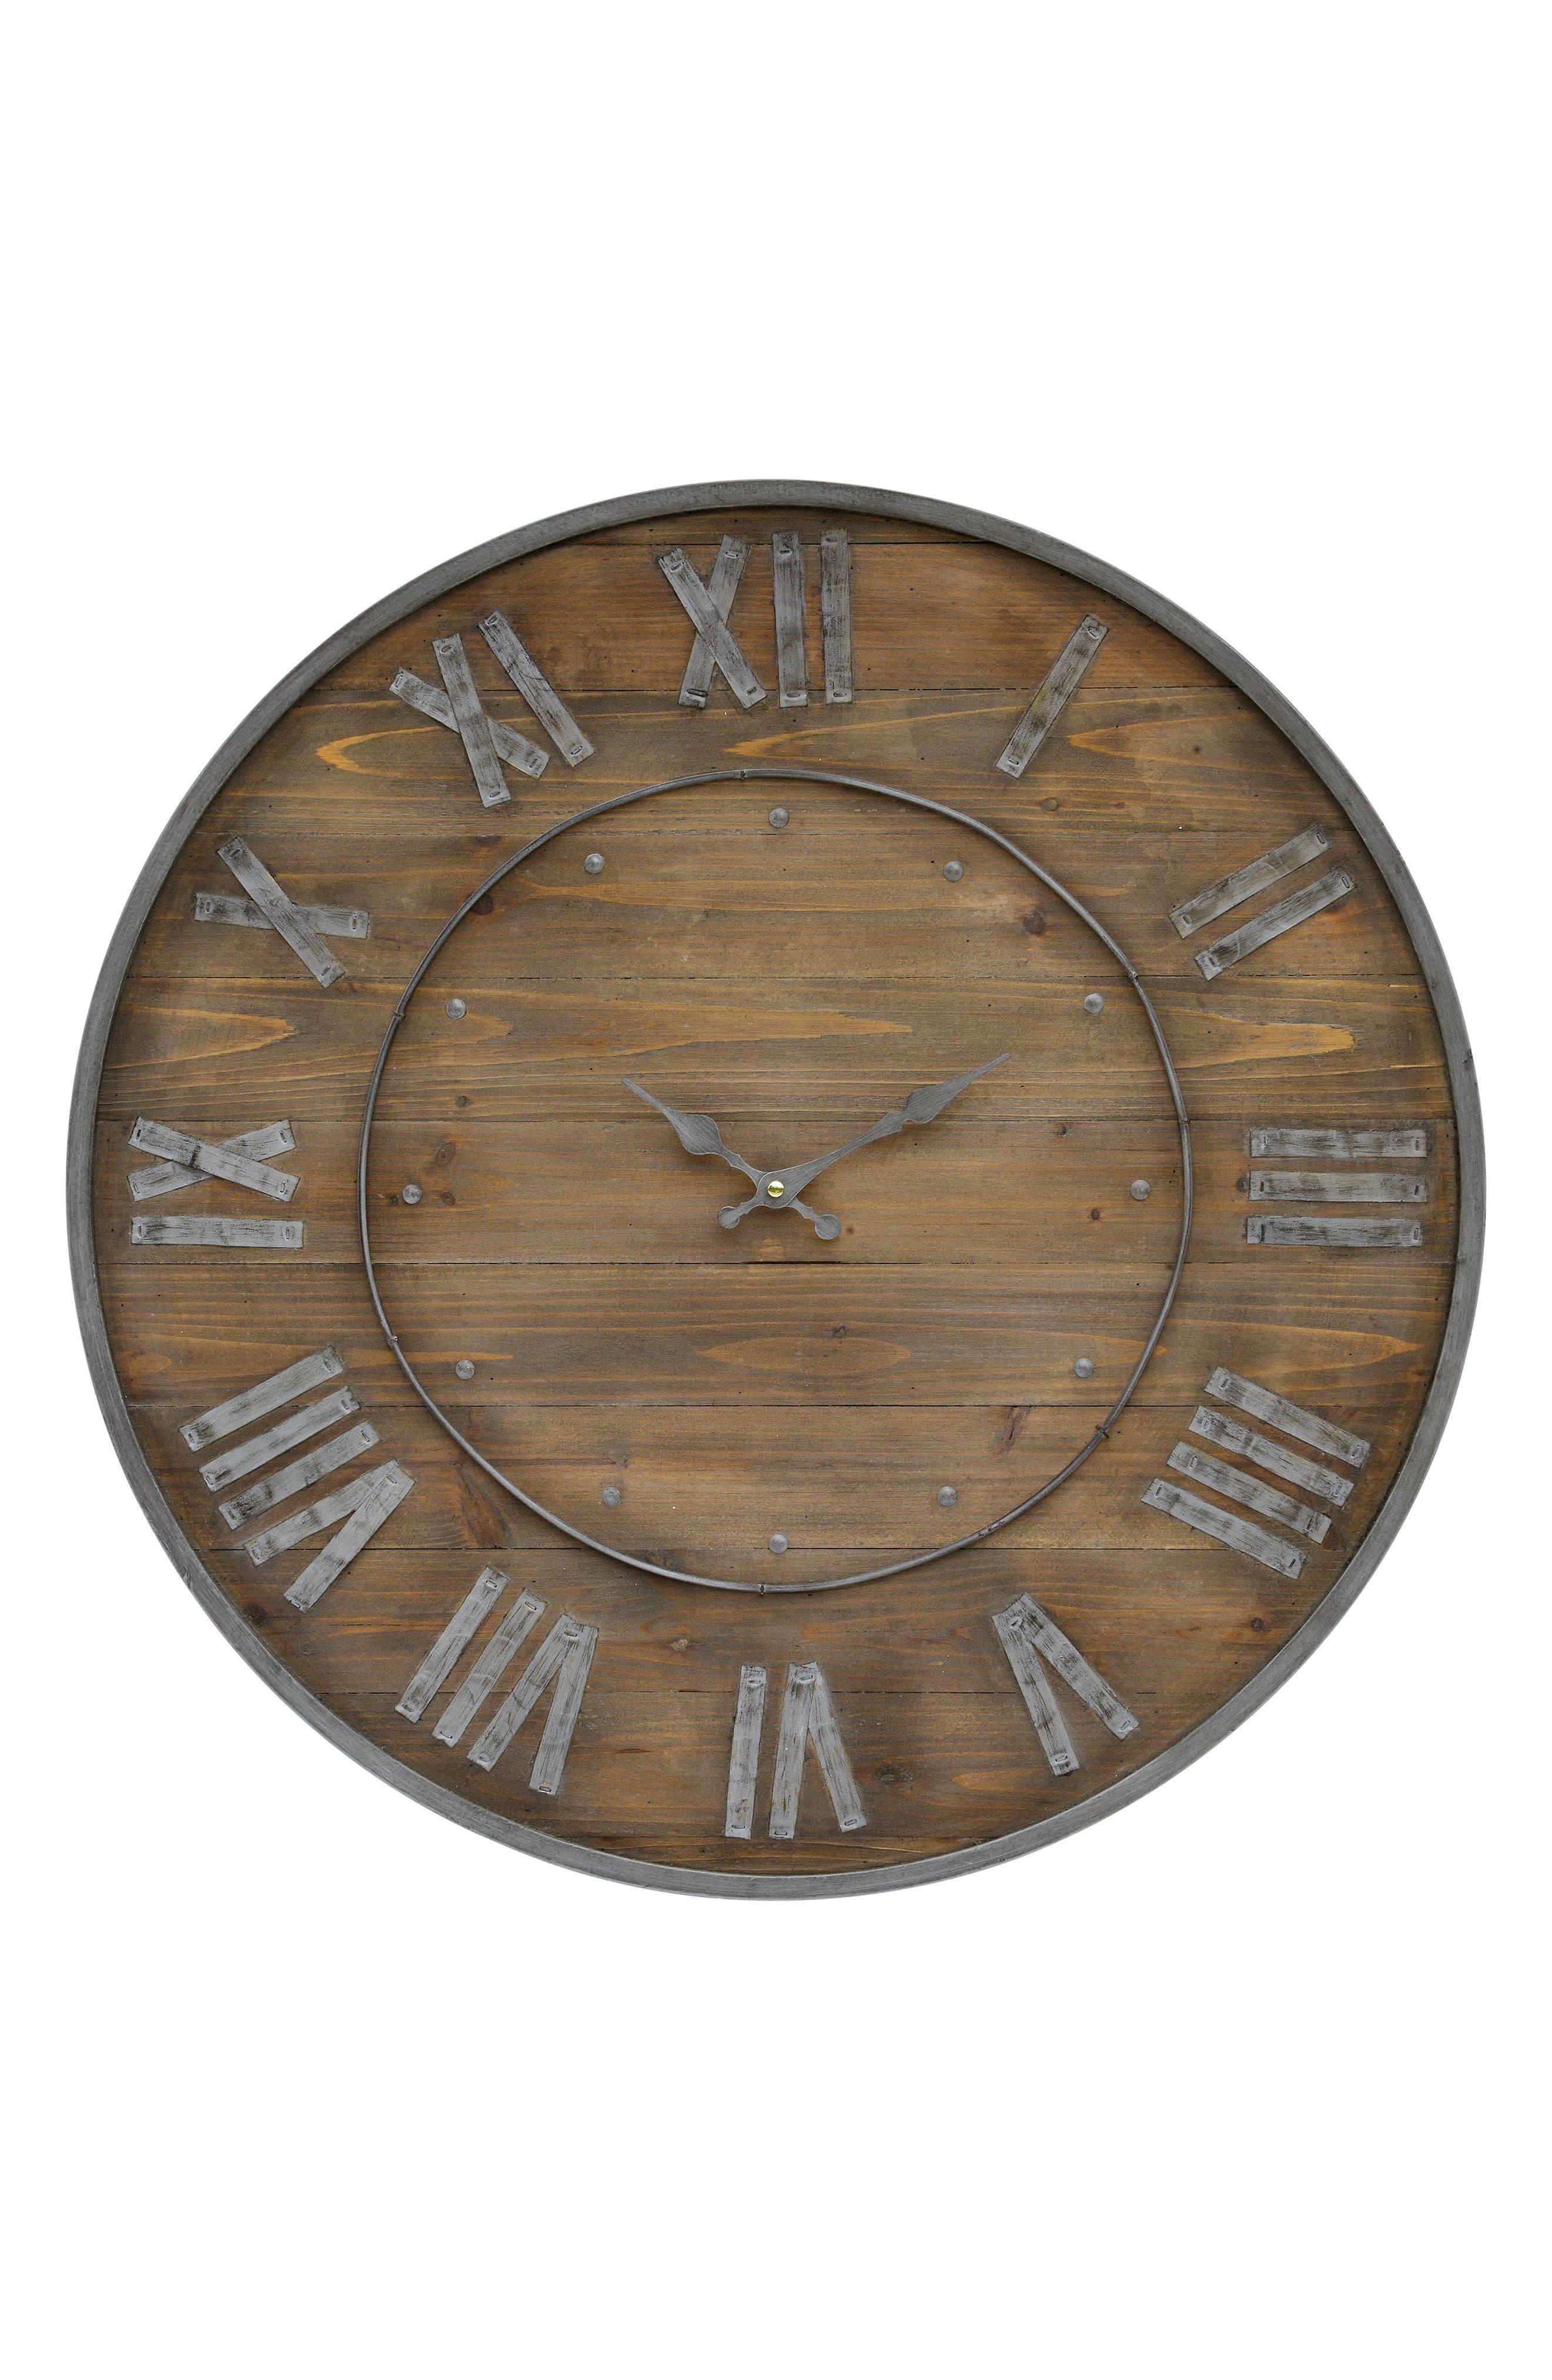 Renwil Wooden Wall Clock